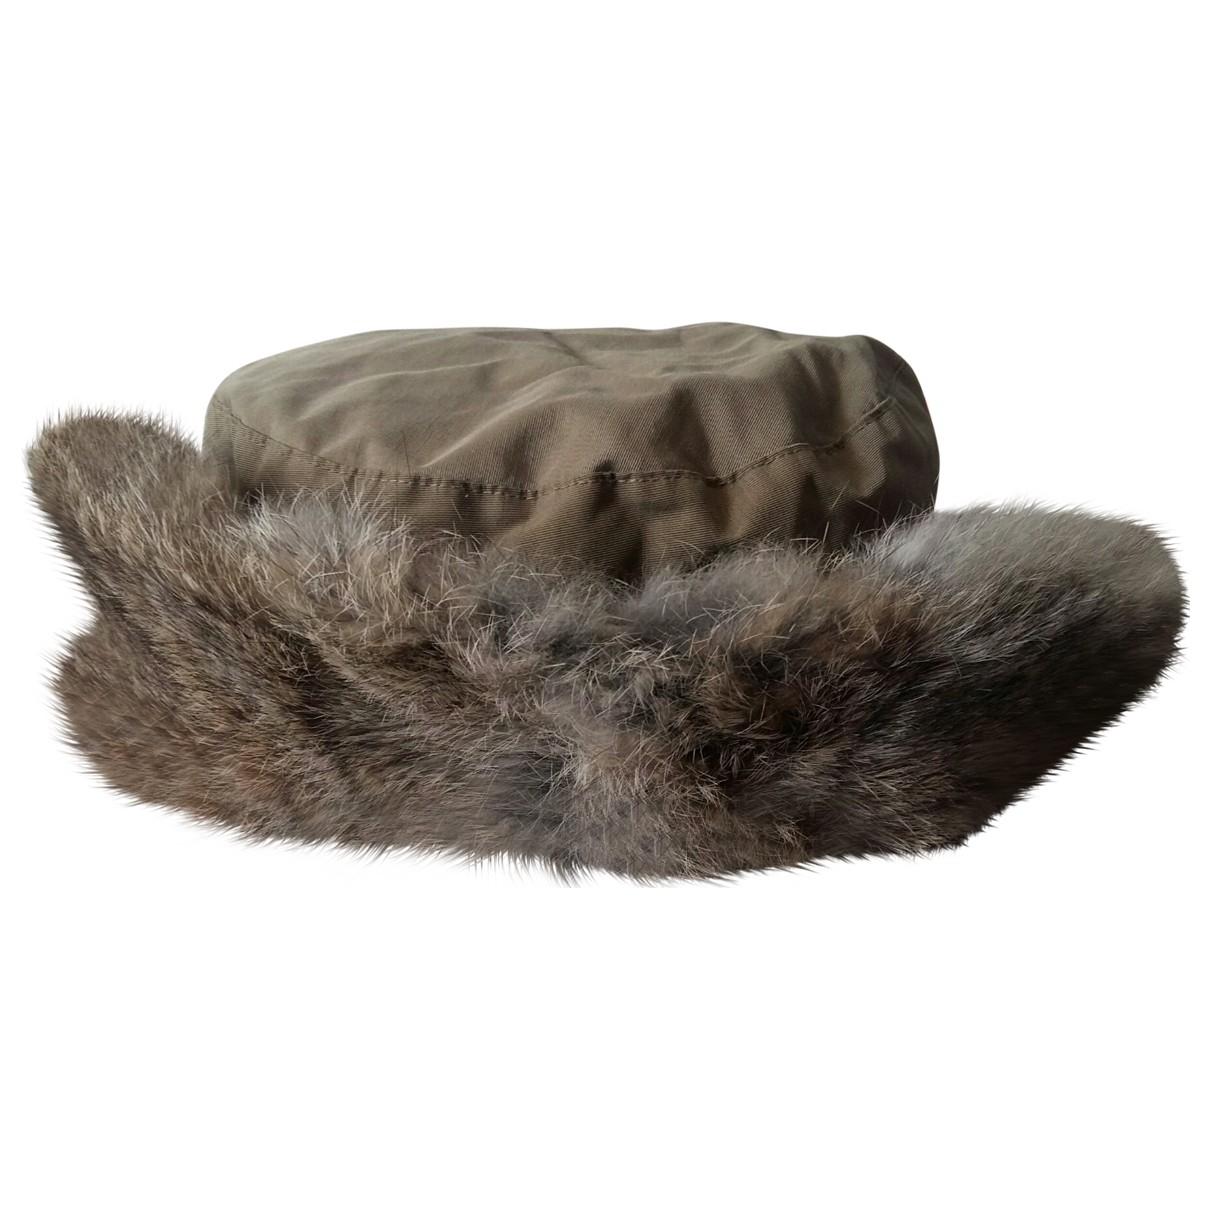 Woolrich \N Ecru Rabbit hat for Women S International